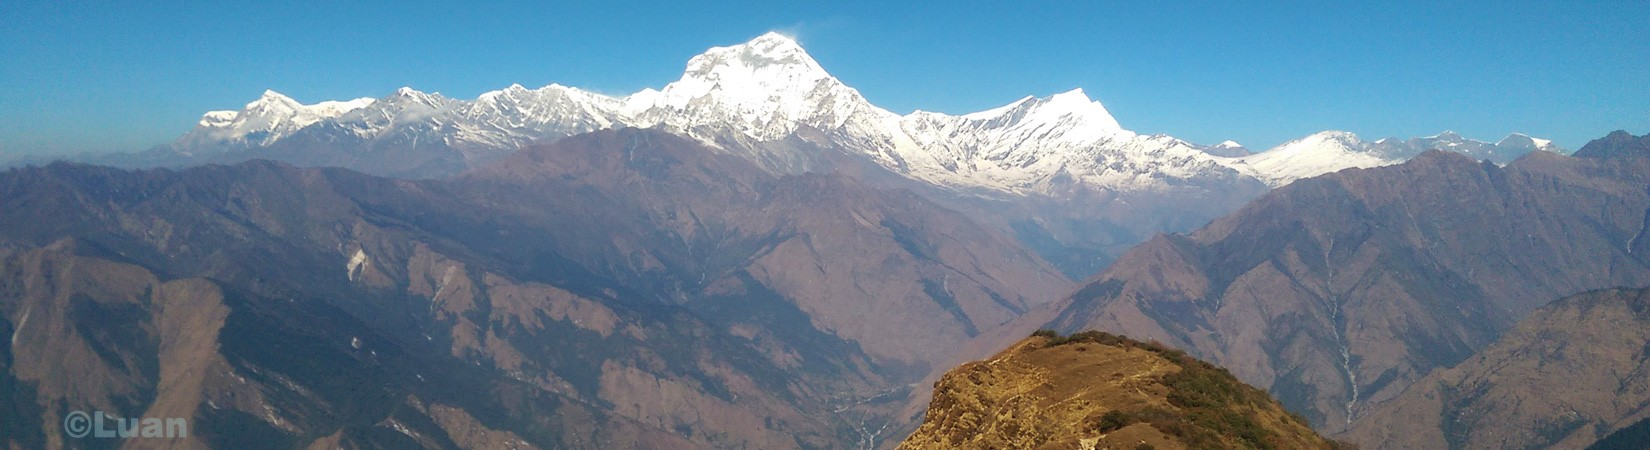 mt dhaulagiri from khopara ridge trekking